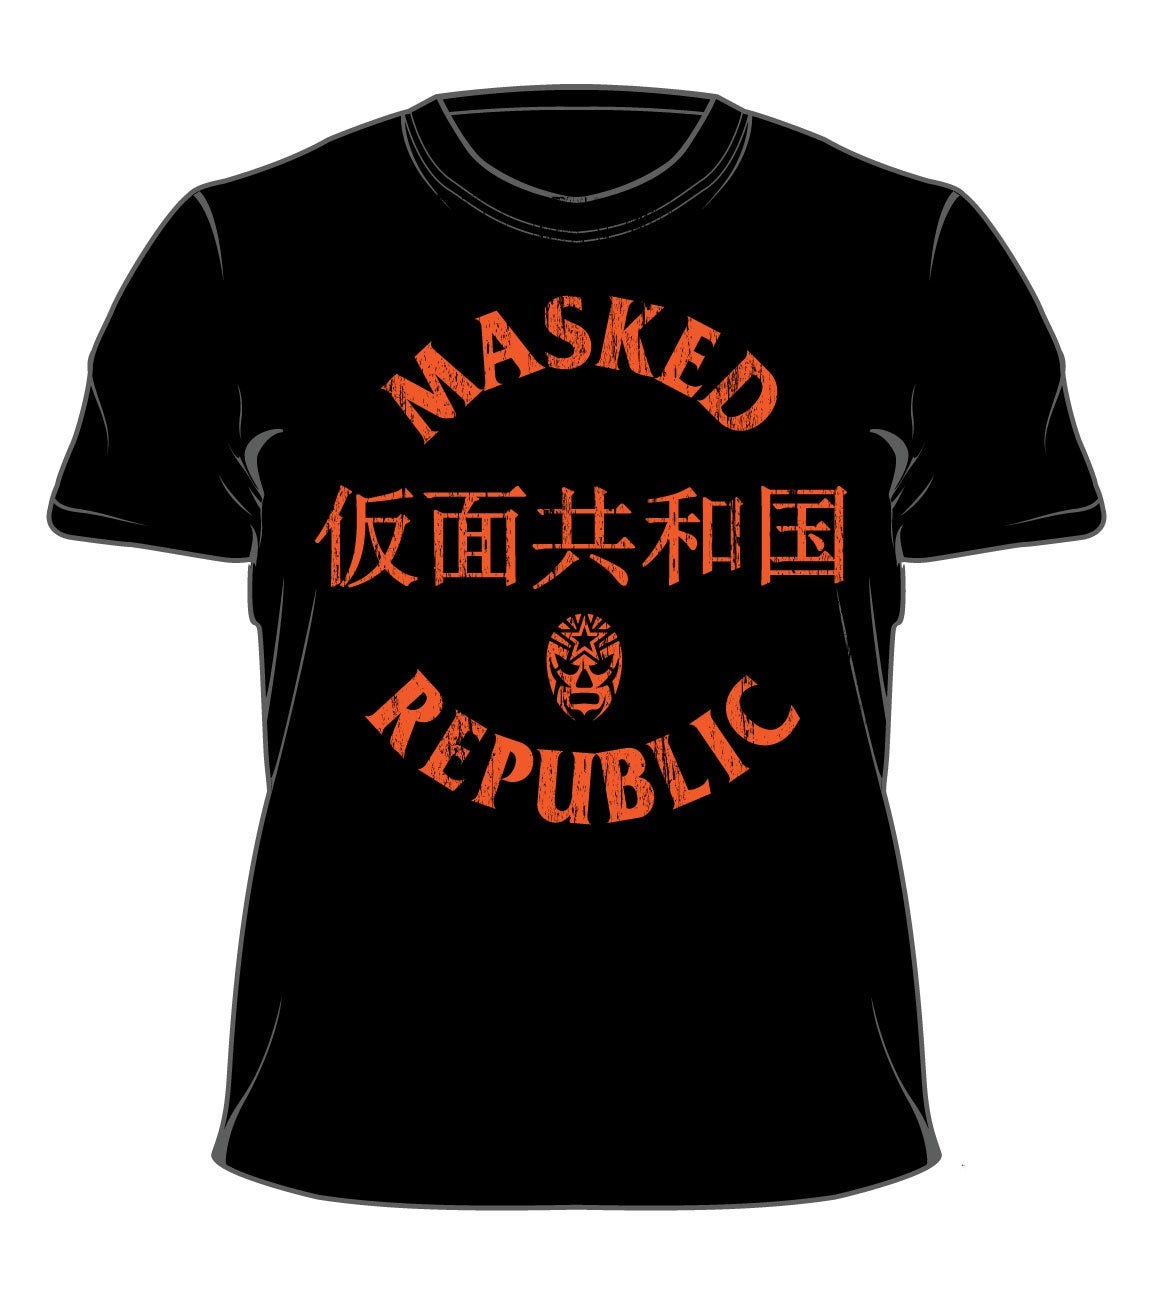 Image of Masked Republic Far East T-shirt